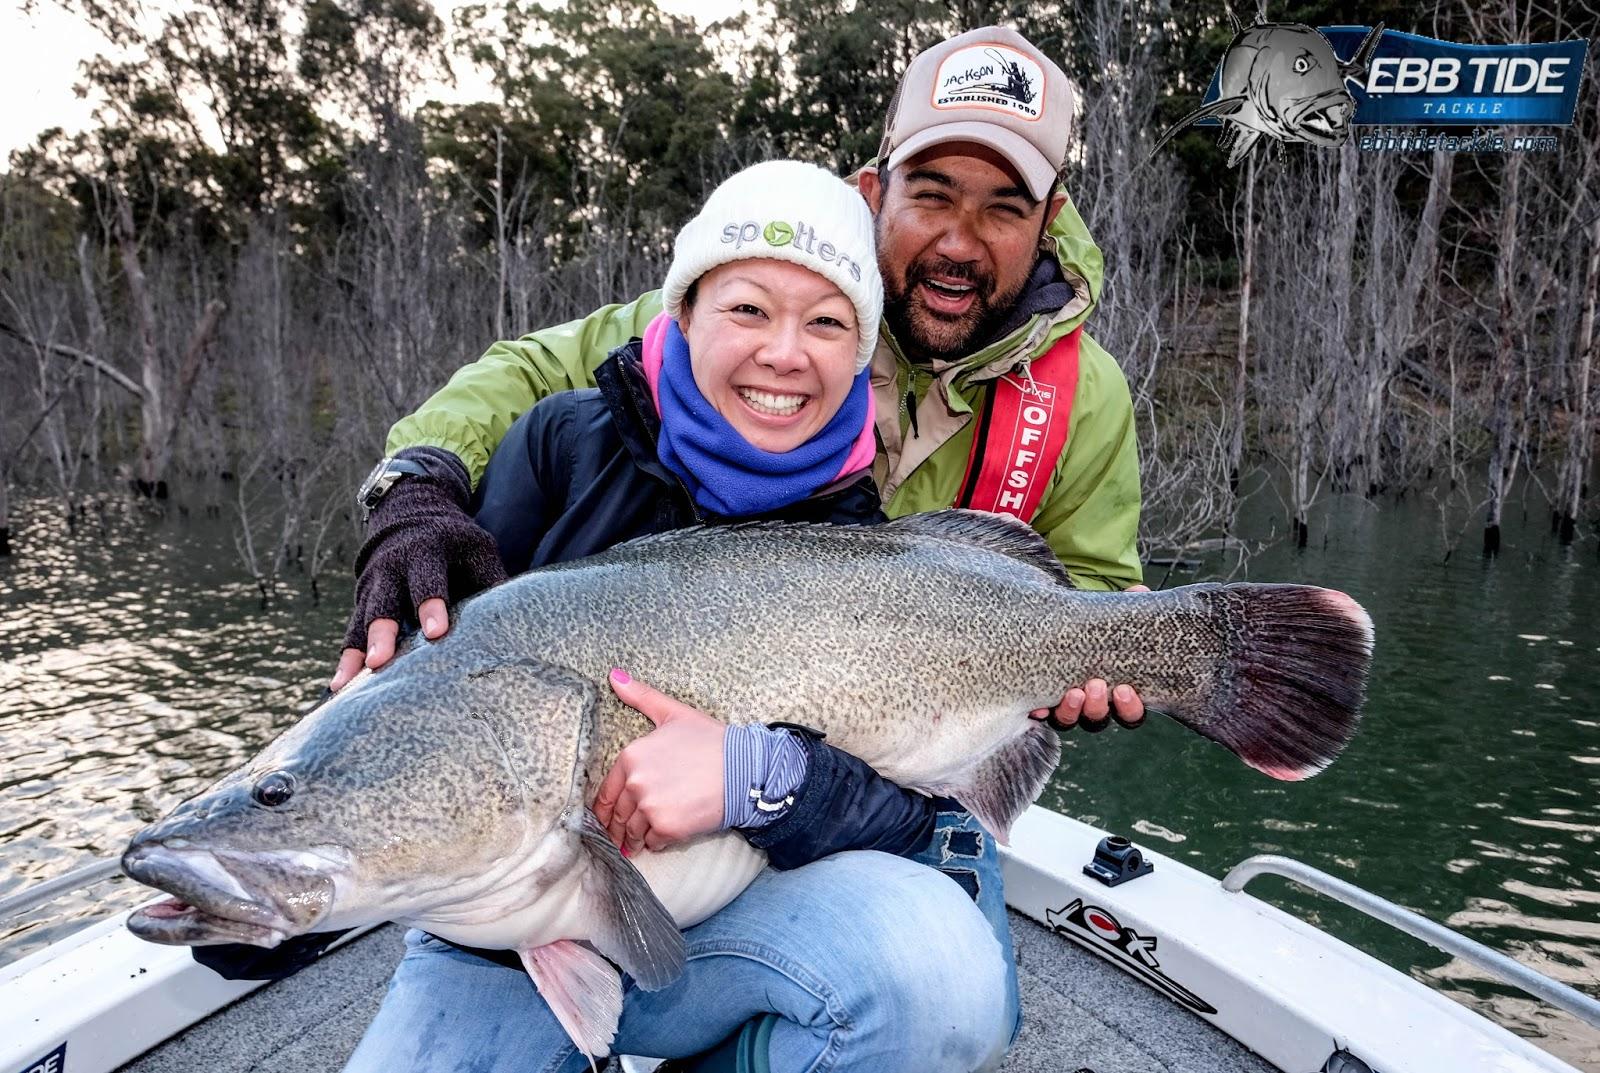 Ebb tide tackle the blog fishing kaki and the murray cod for Joy fishing tackle